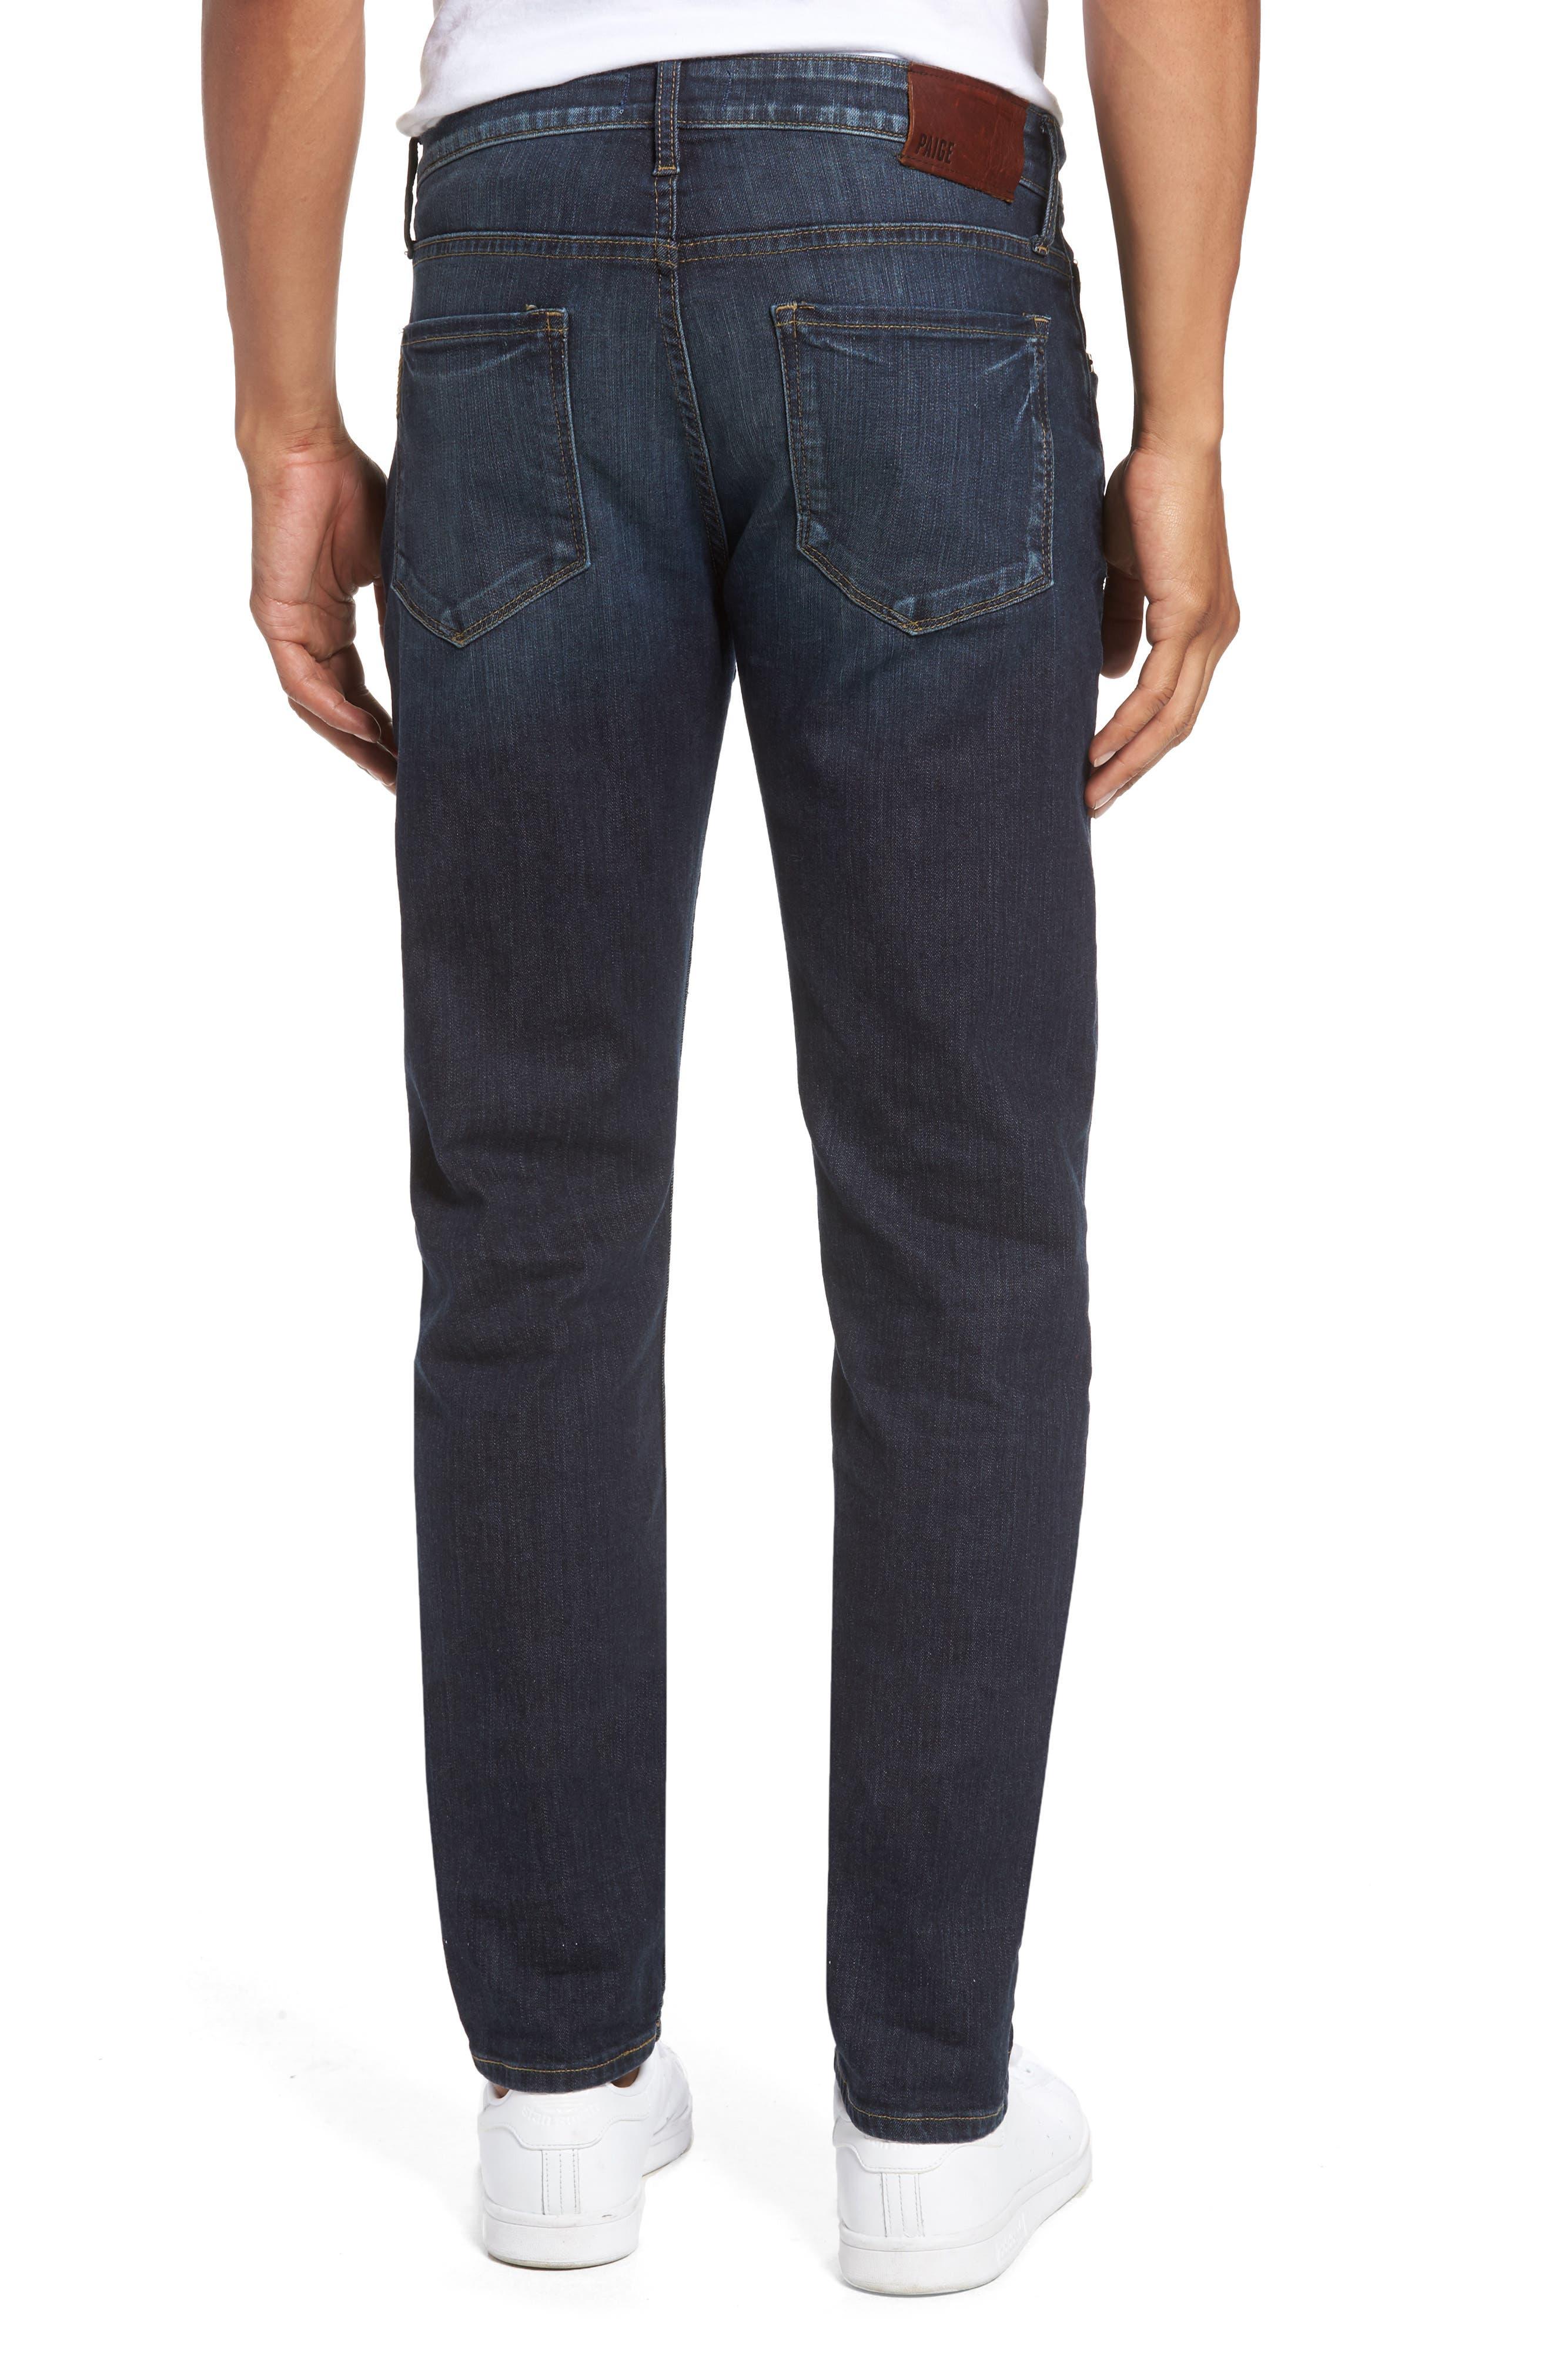 Lennox Slim Fit Jeans,                             Alternate thumbnail 2, color,                             400